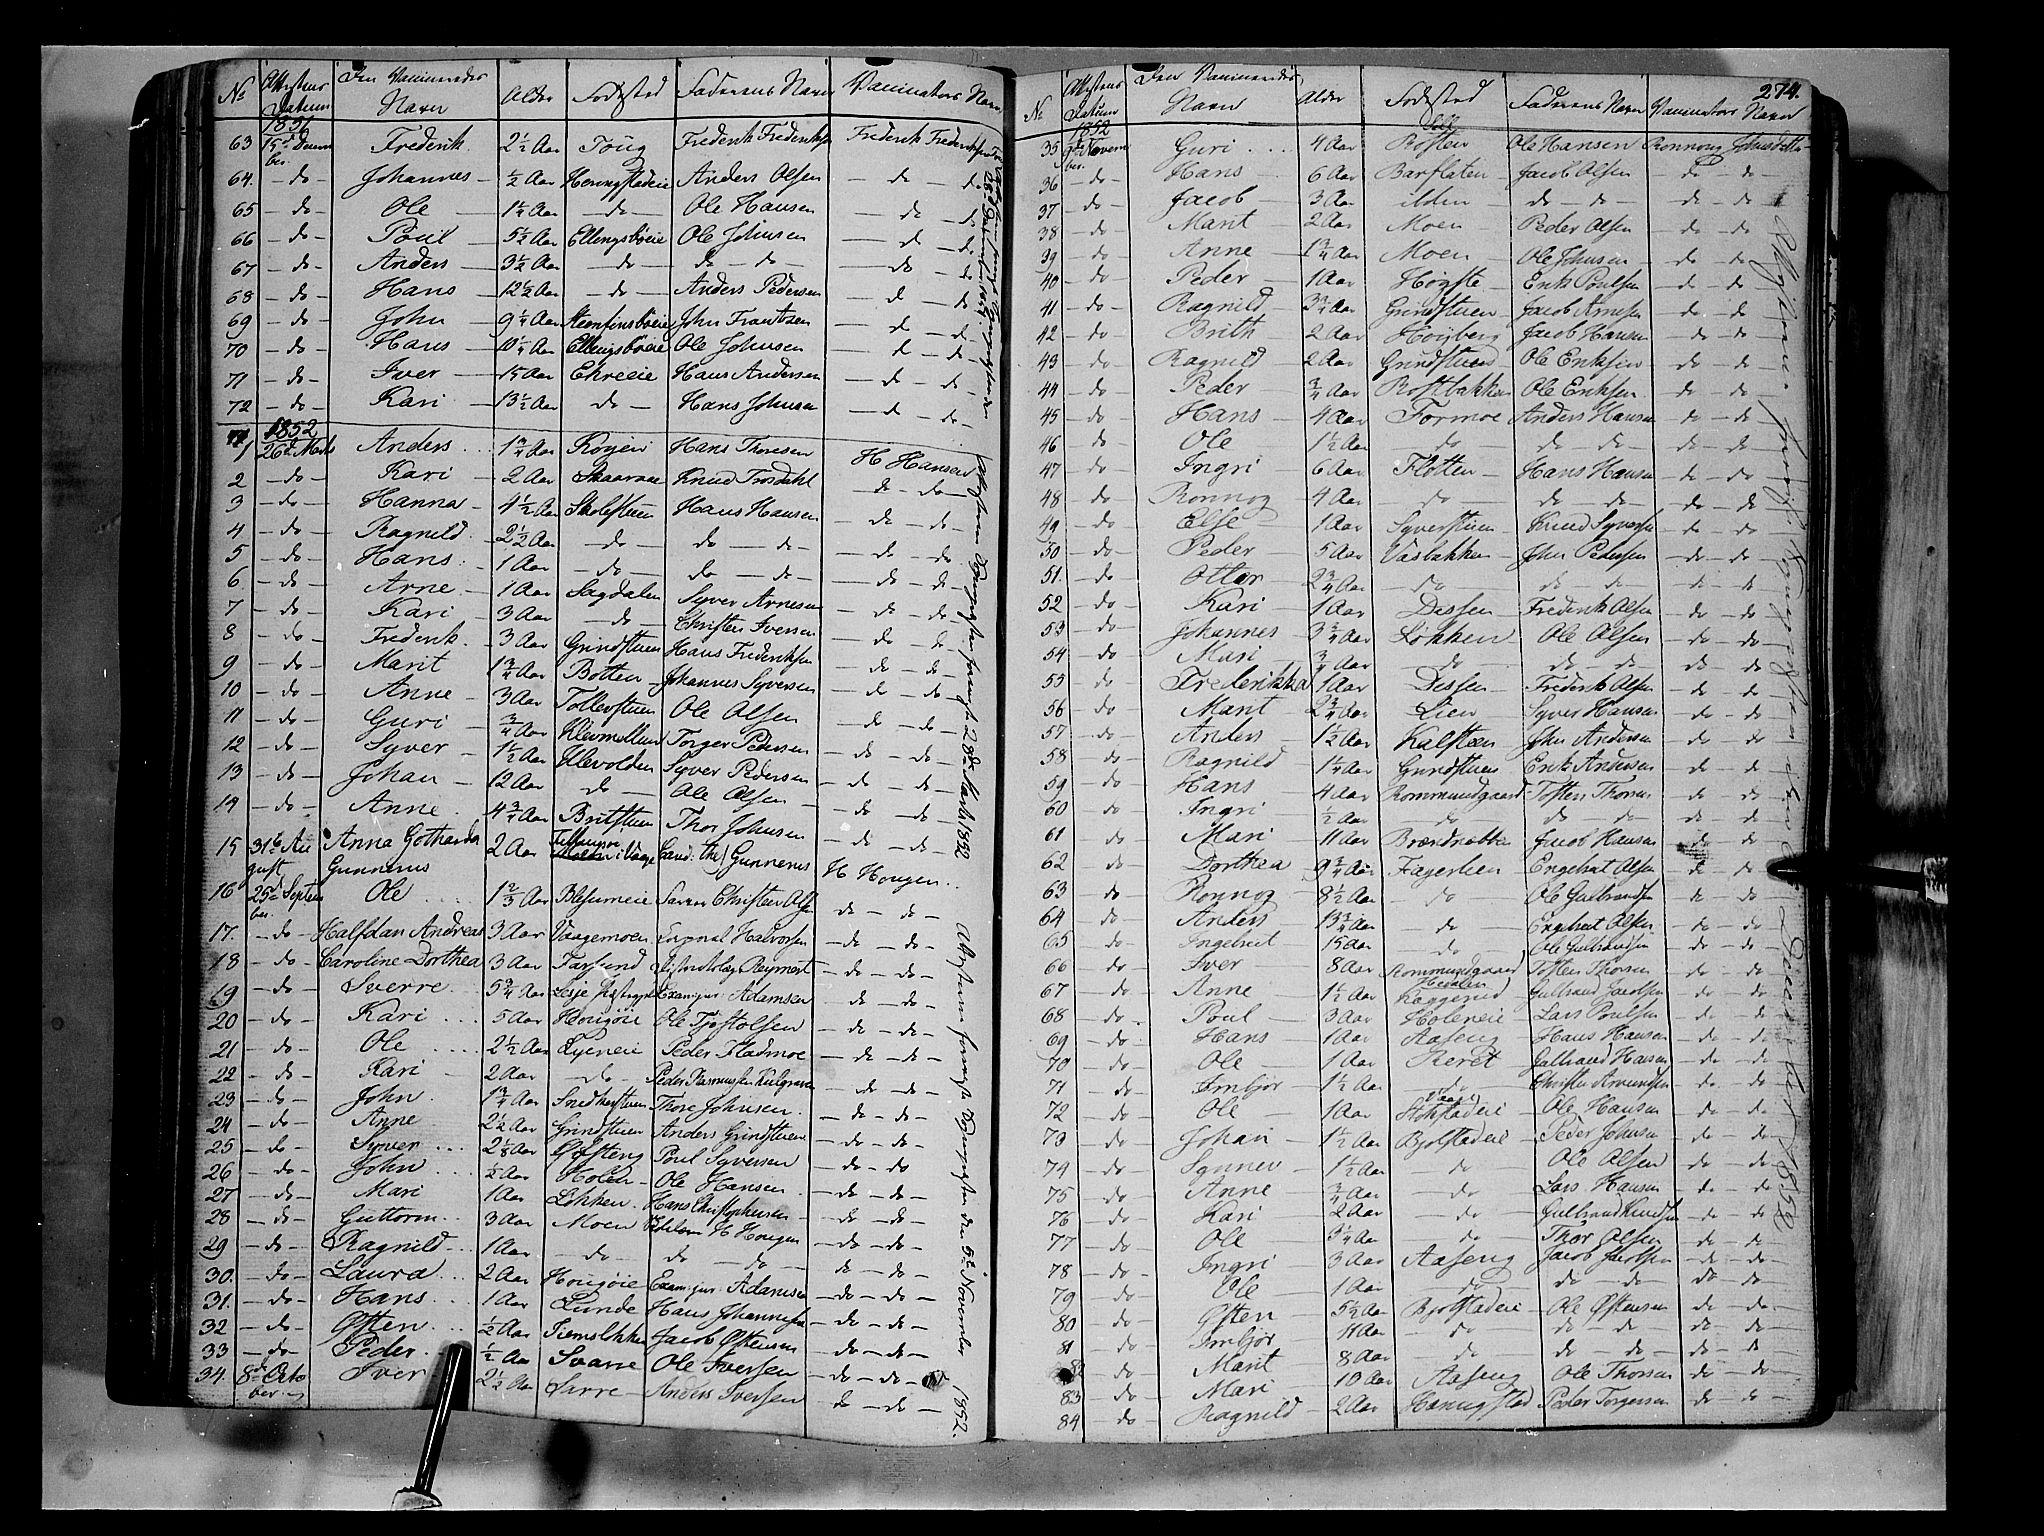 SAH, Vågå prestekontor, Ministerialbok nr. 5 /1, 1842-1856, s. 274